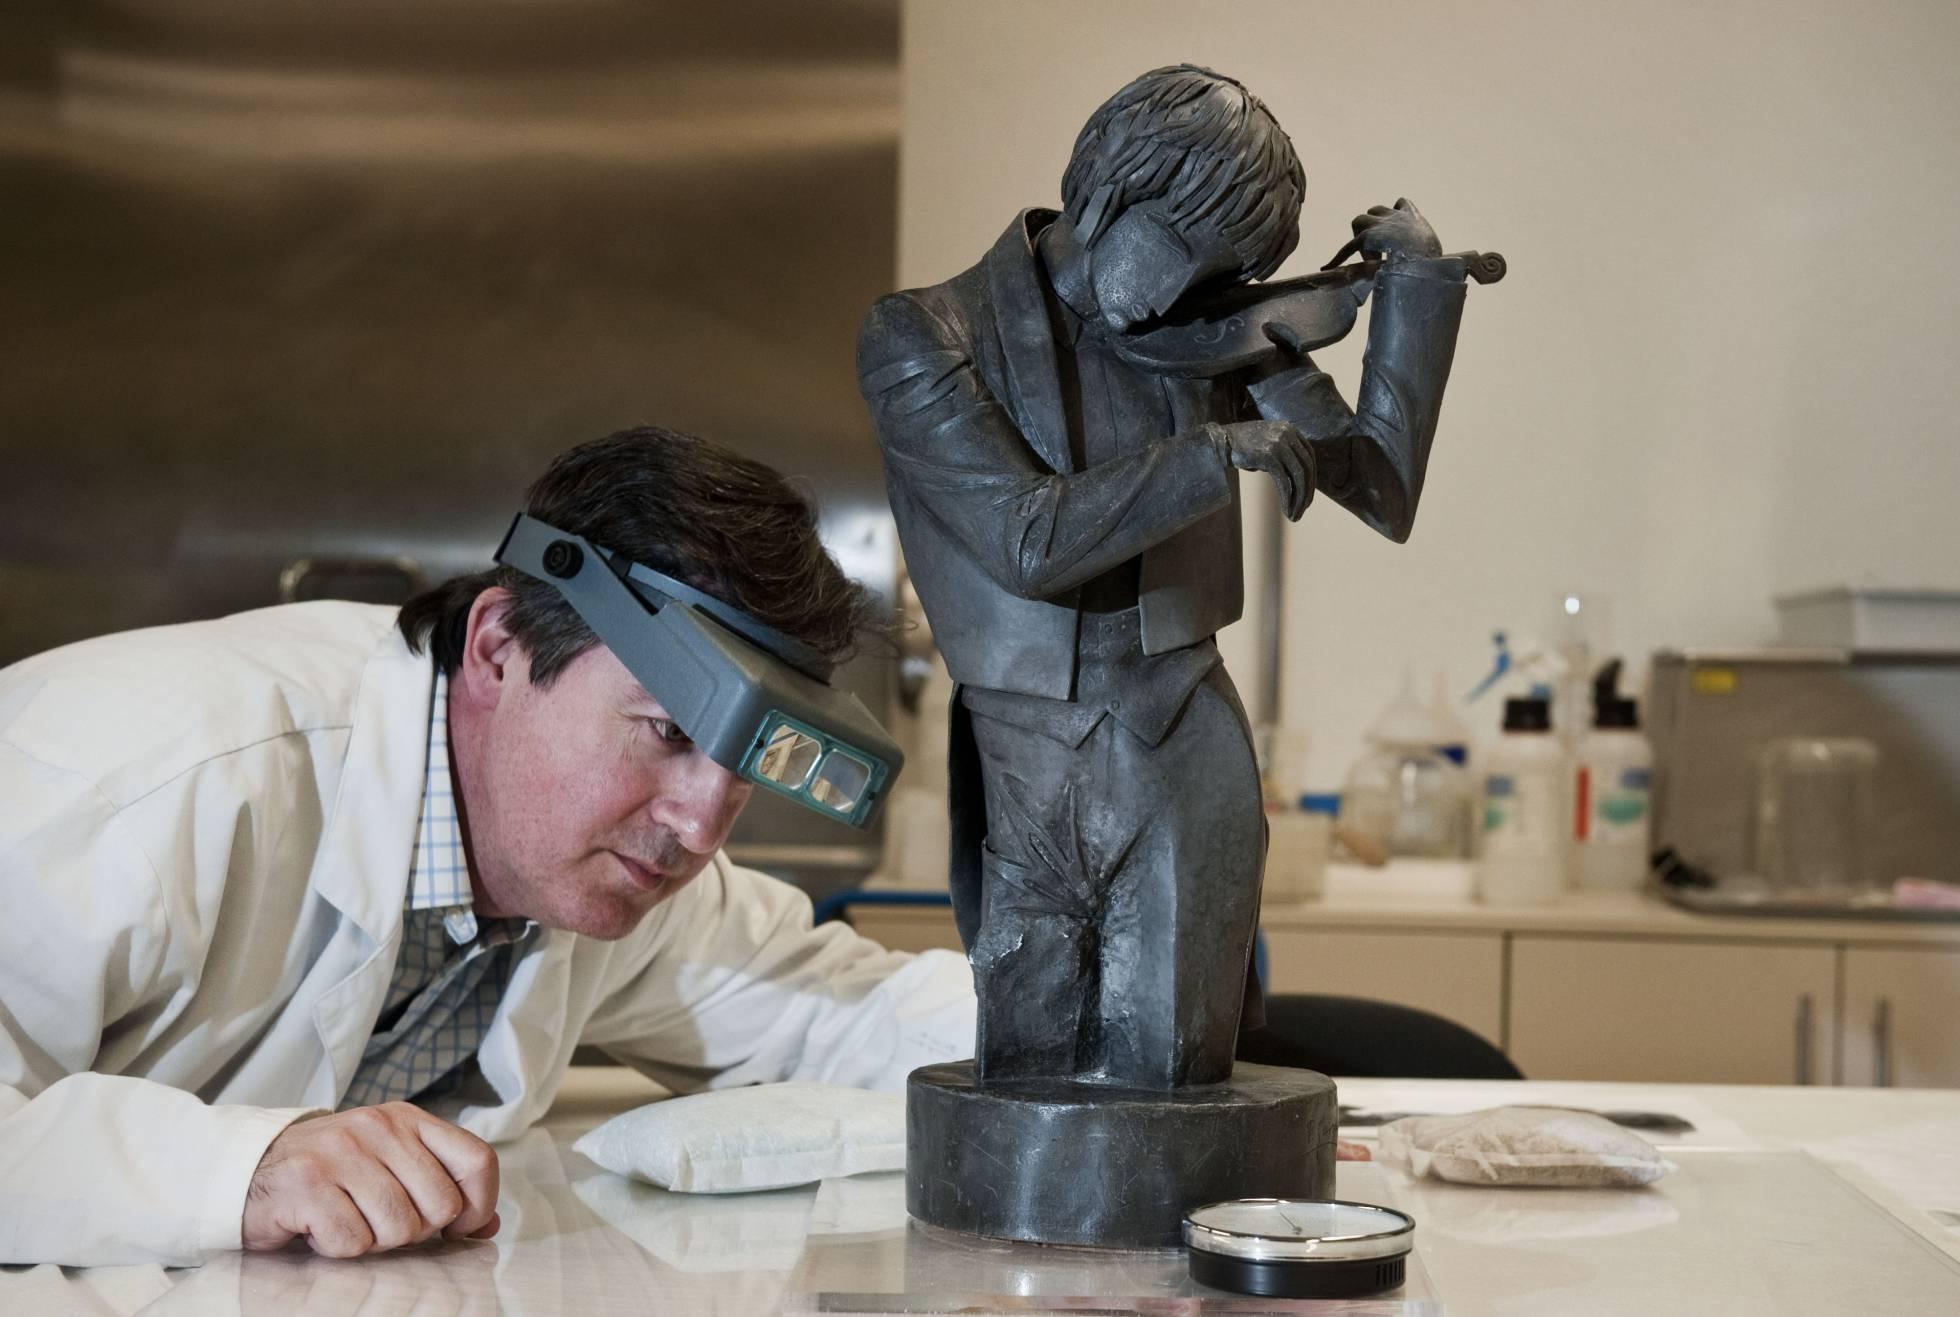 Àlex Masalles examinando la escultura